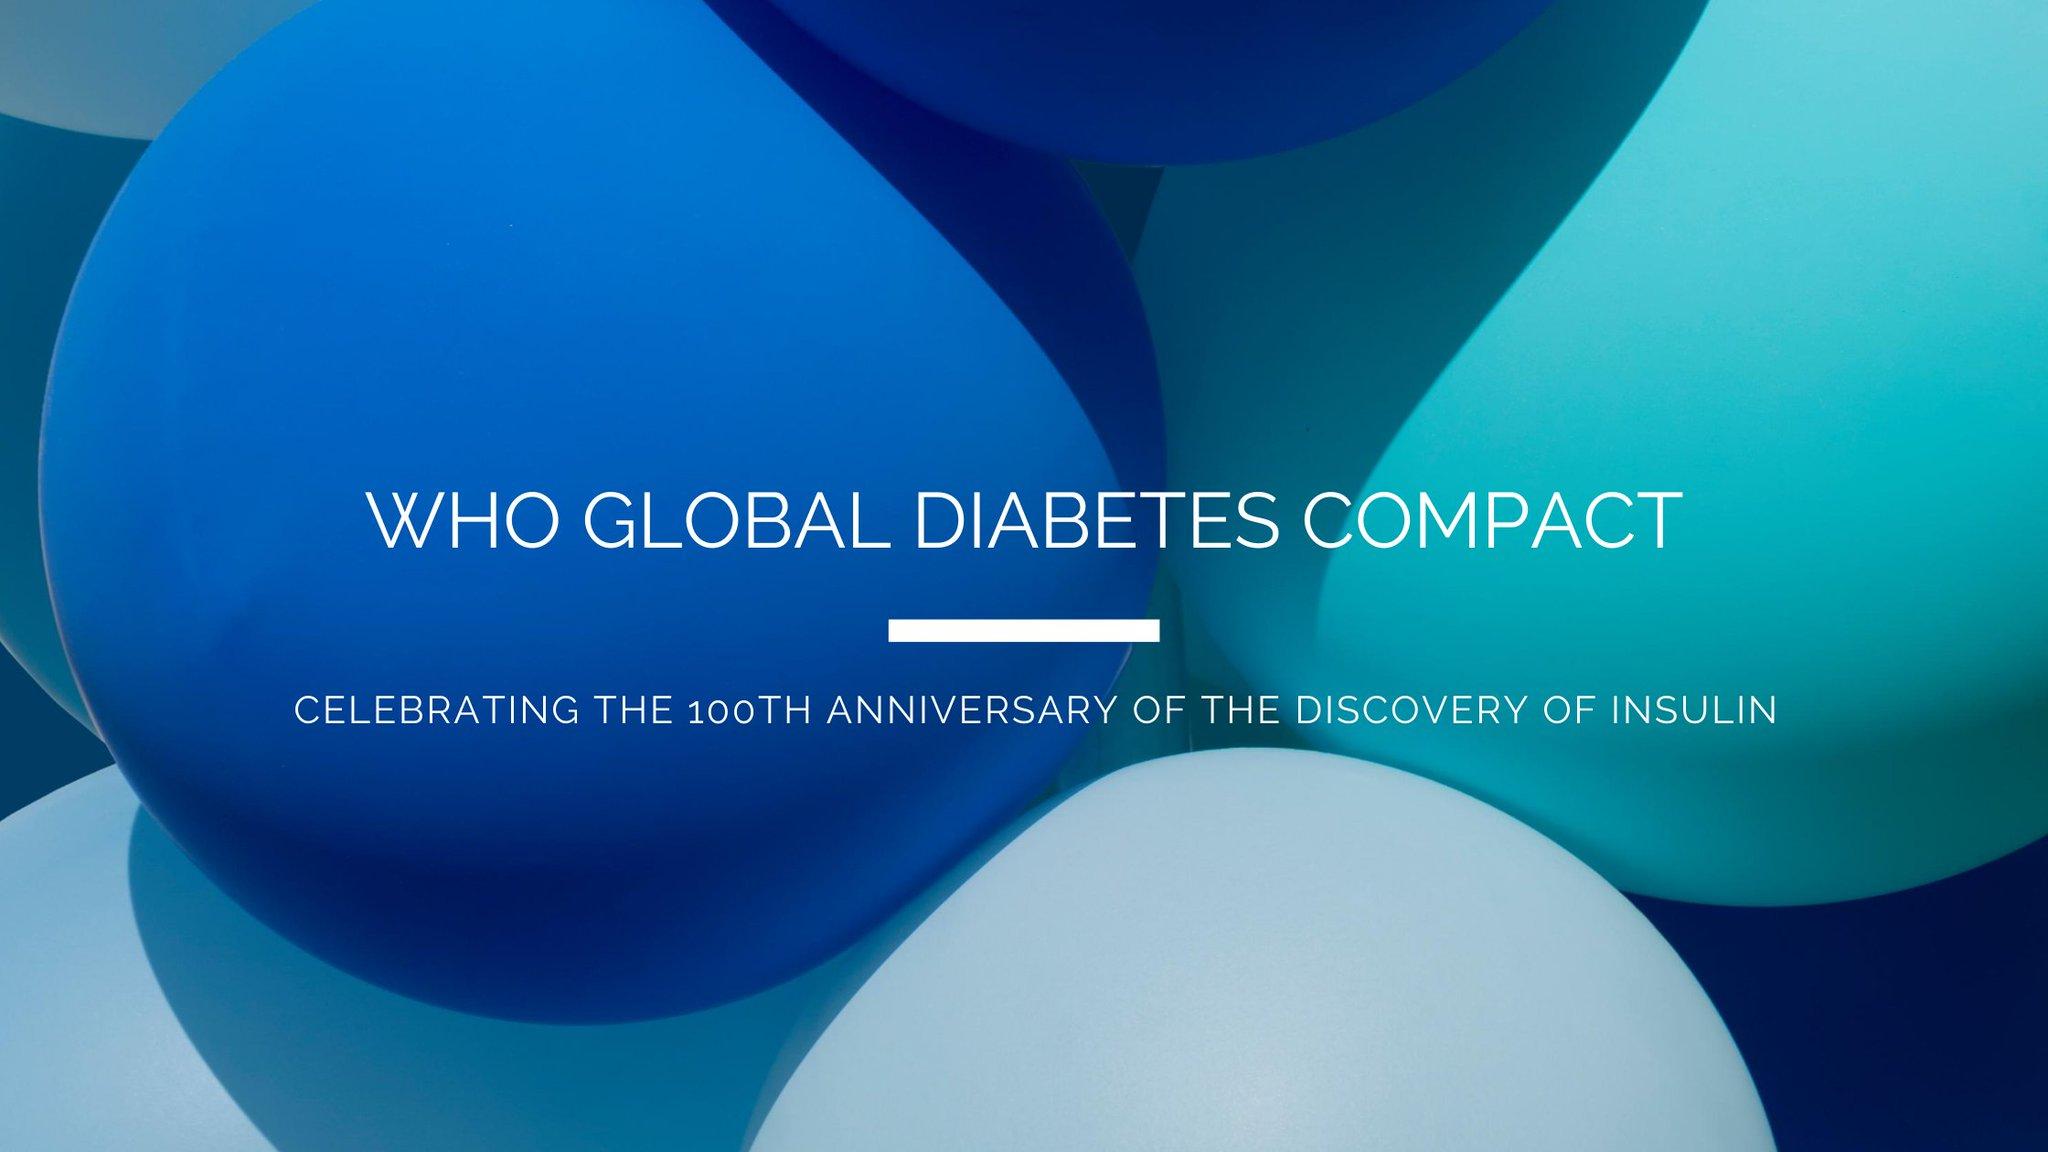 Globla Diabetes Compact